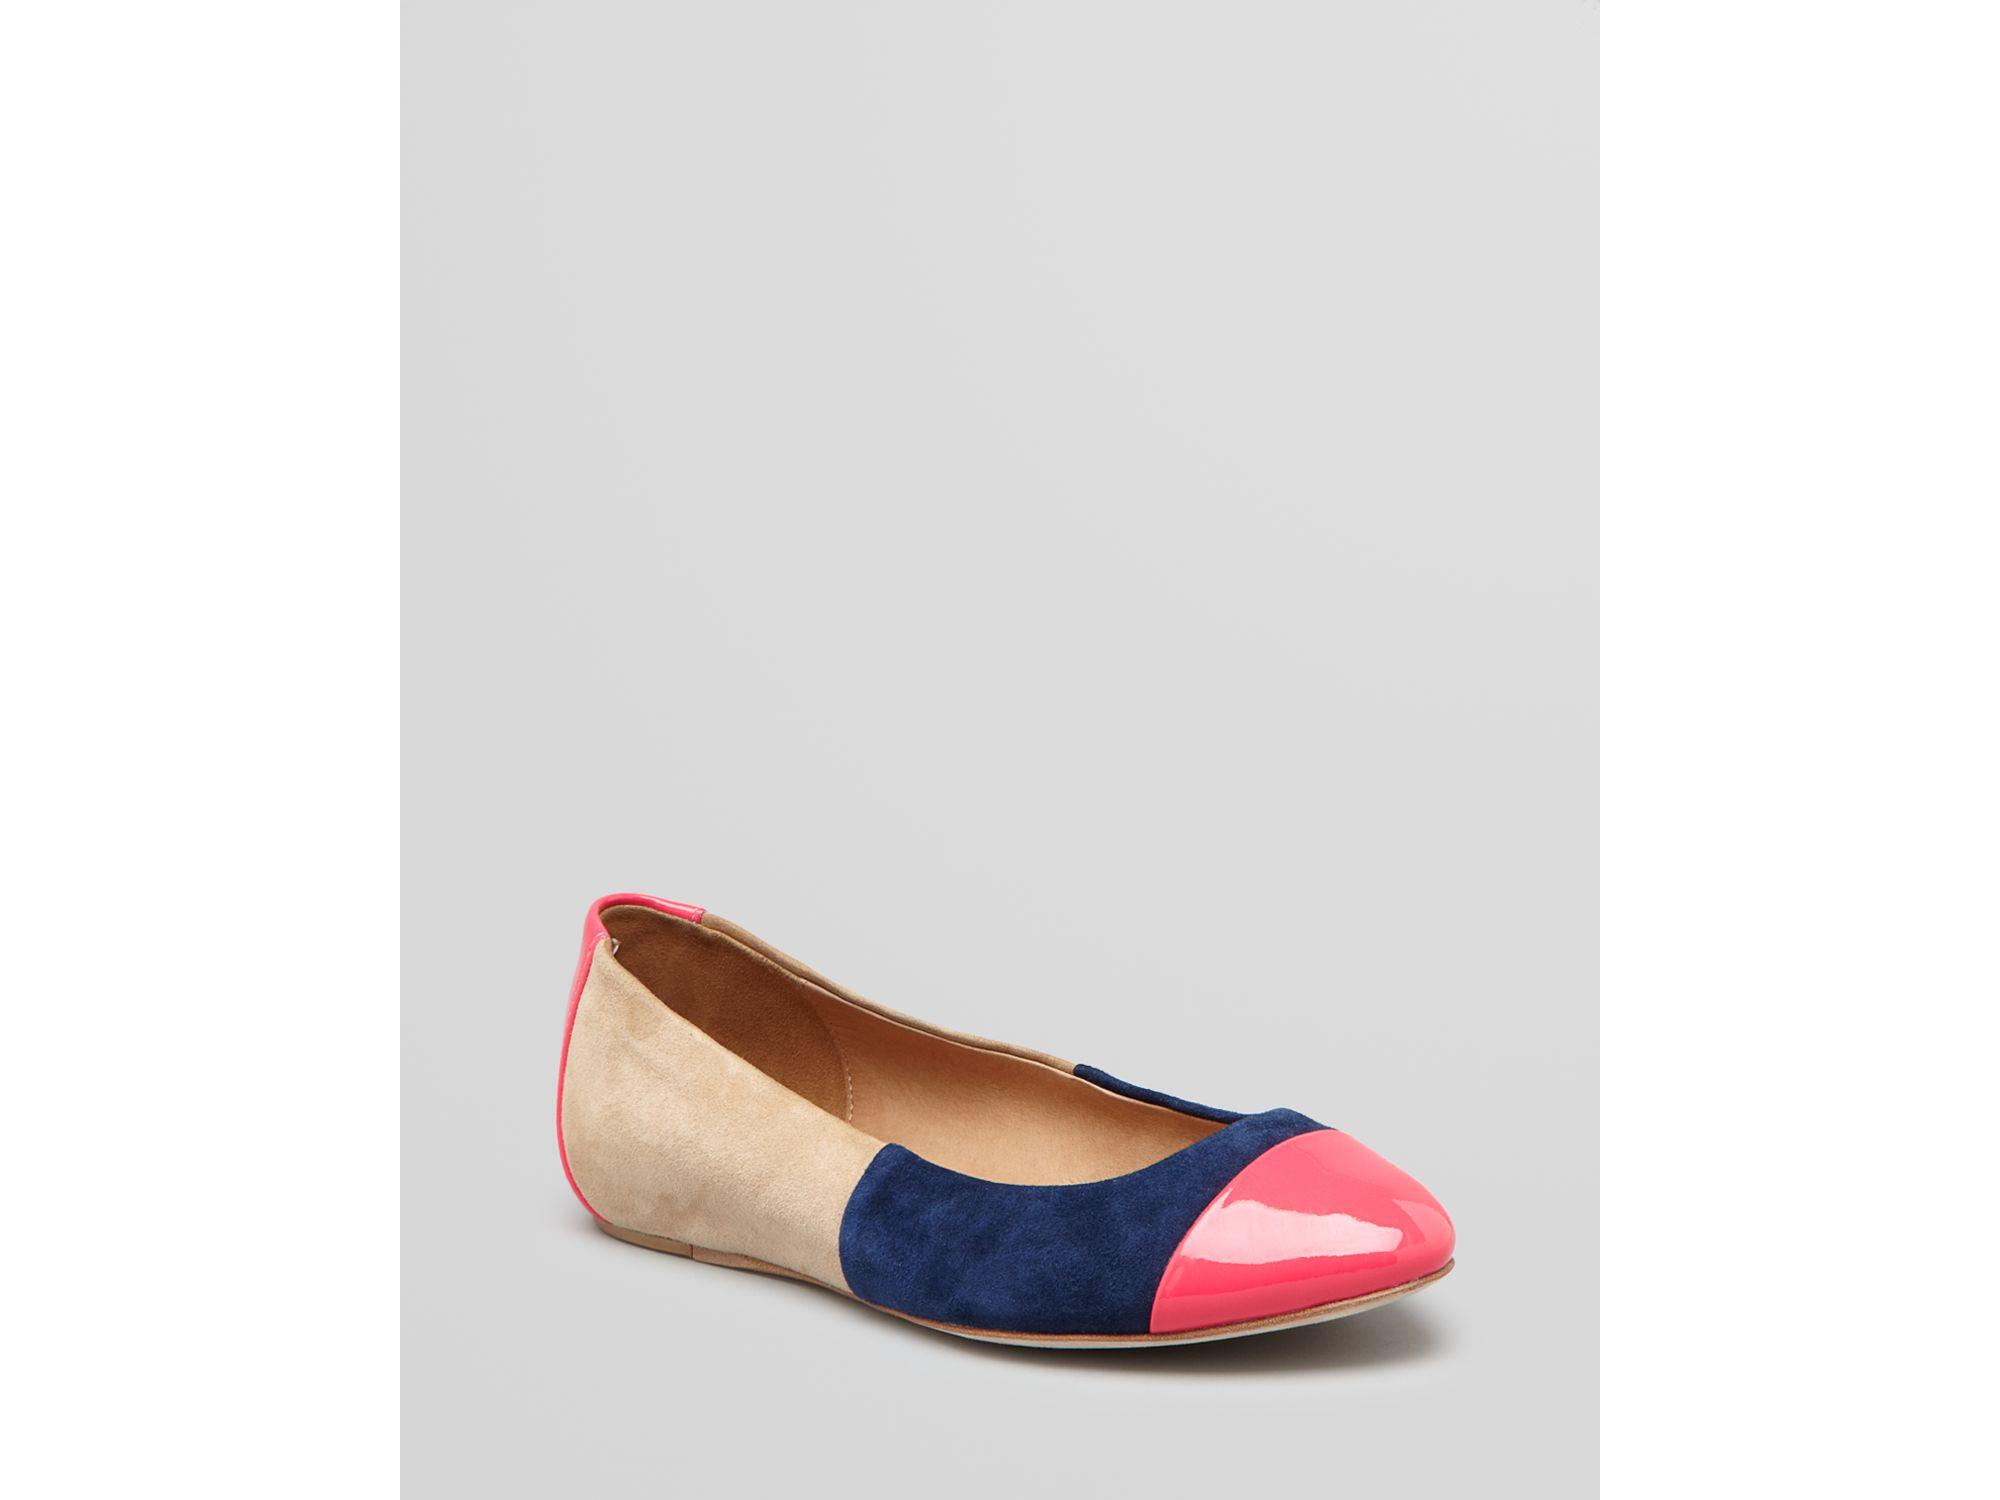 ella moss flats lainie colorblock in multicolor neon pink